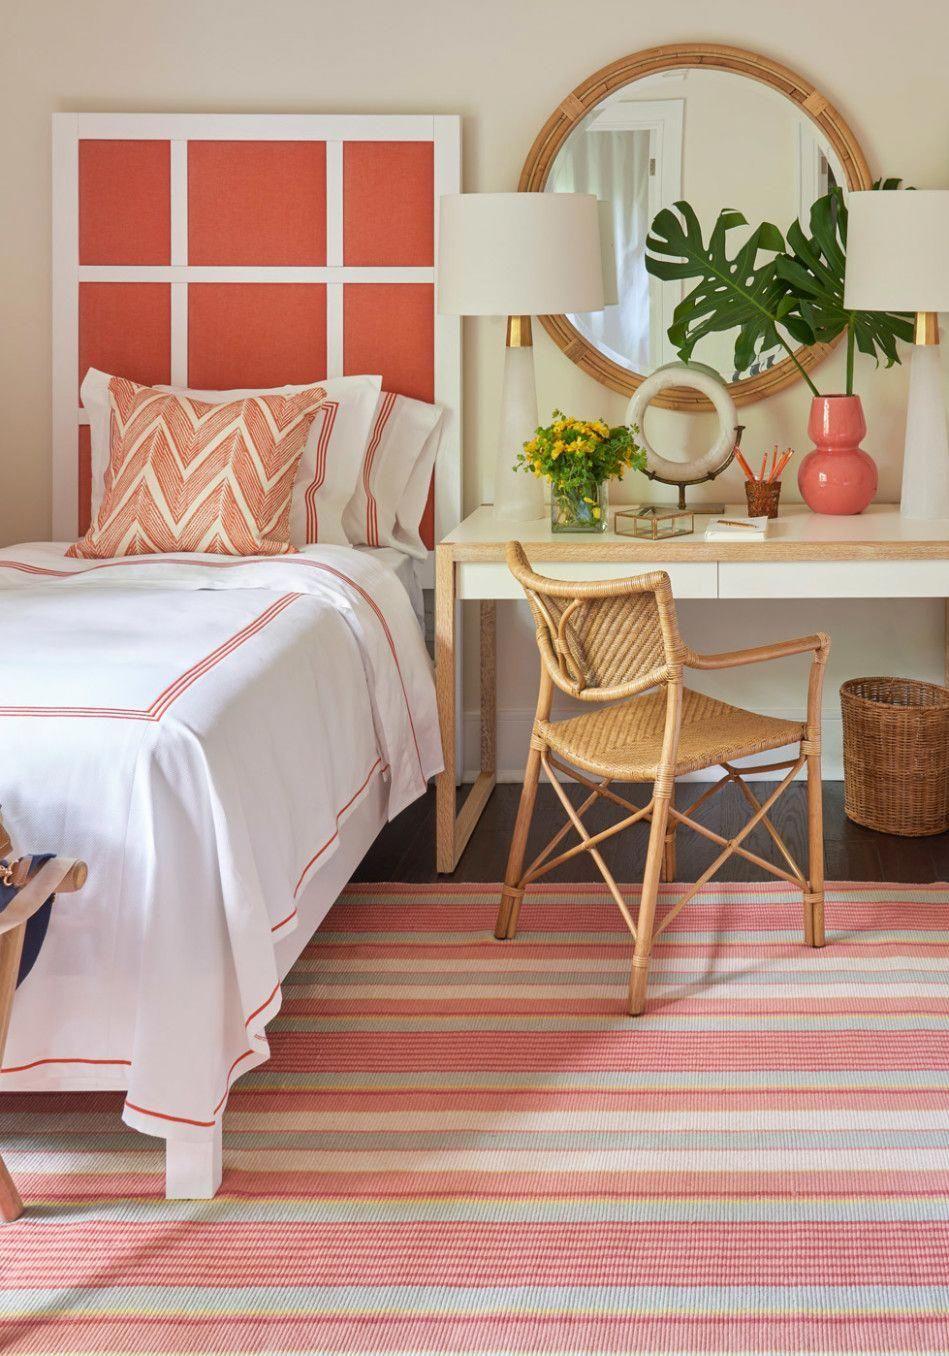 6 decorating secrets from a top interior designer topinteriordesignanddecor